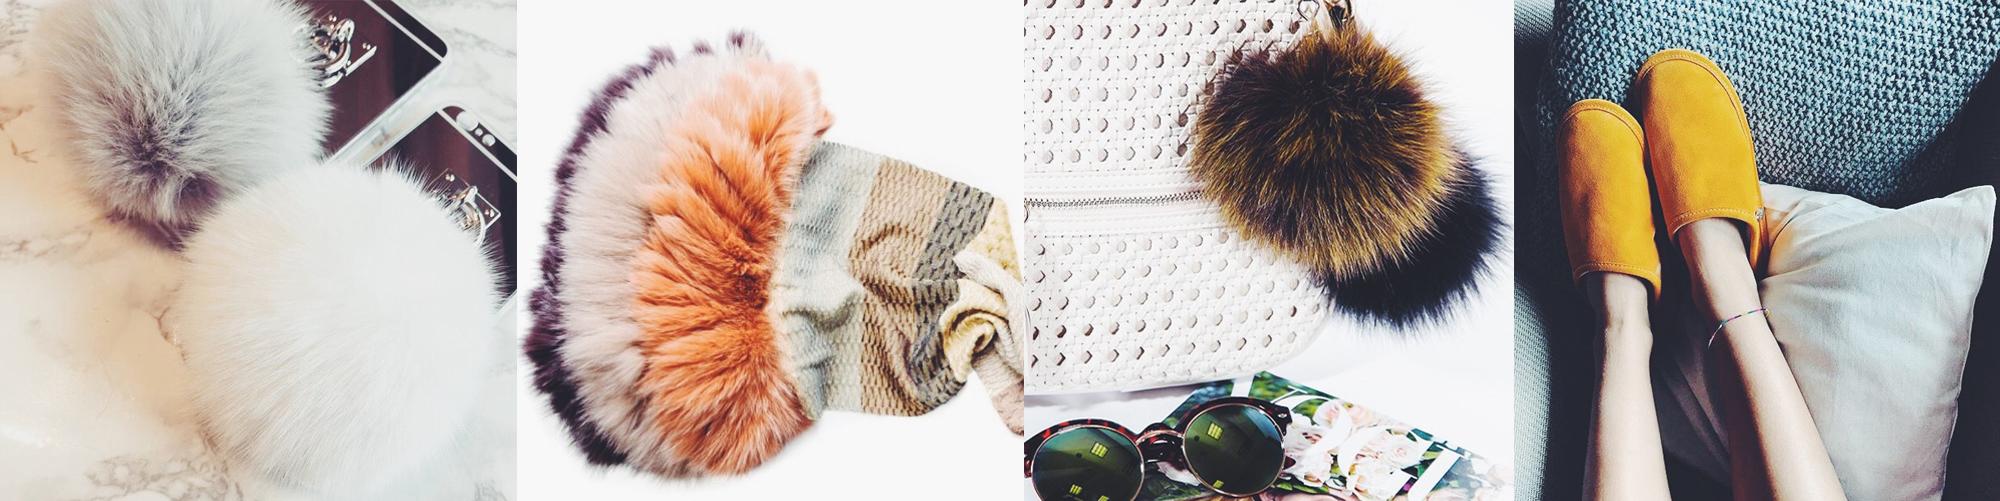 fur guru, fur, fashion, summer, Shopdgcouture, Saga Furs, fox, NAFA, Fuzy fur, shearling